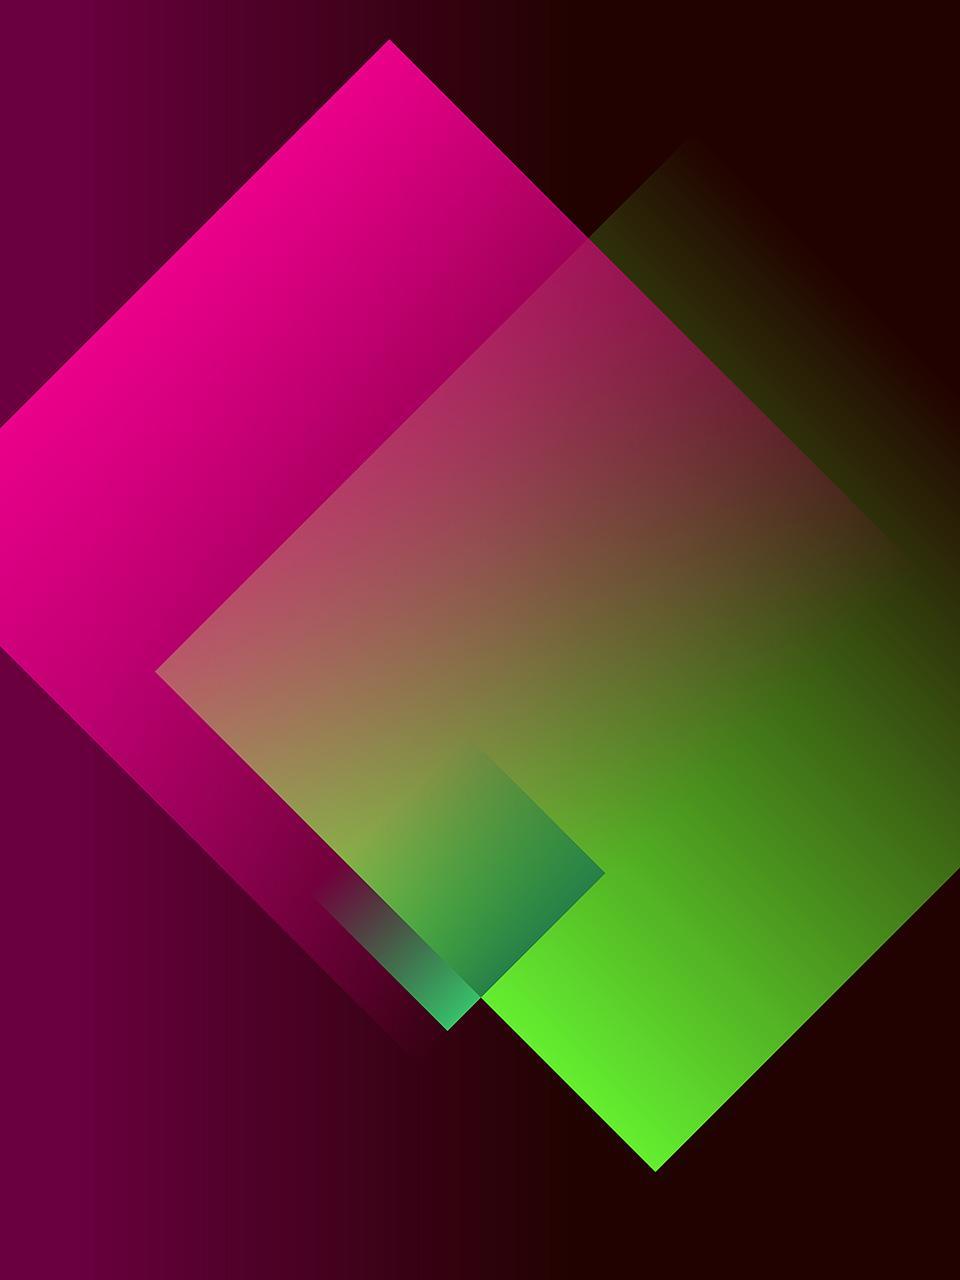 Dcode pink vertical